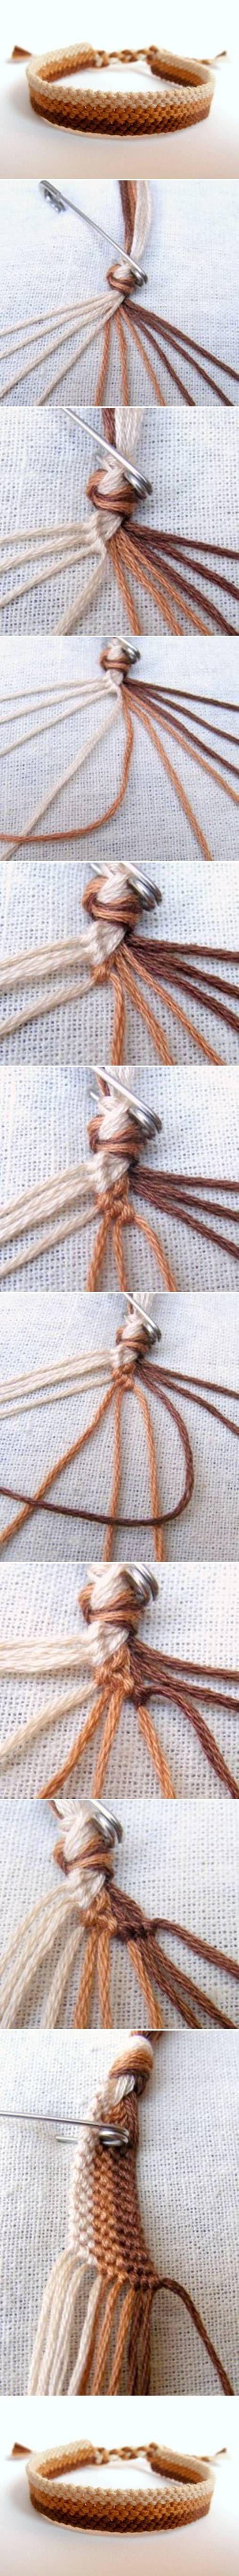 DIY Easy Weave Bracelet DIY Easy Weave Bracelet